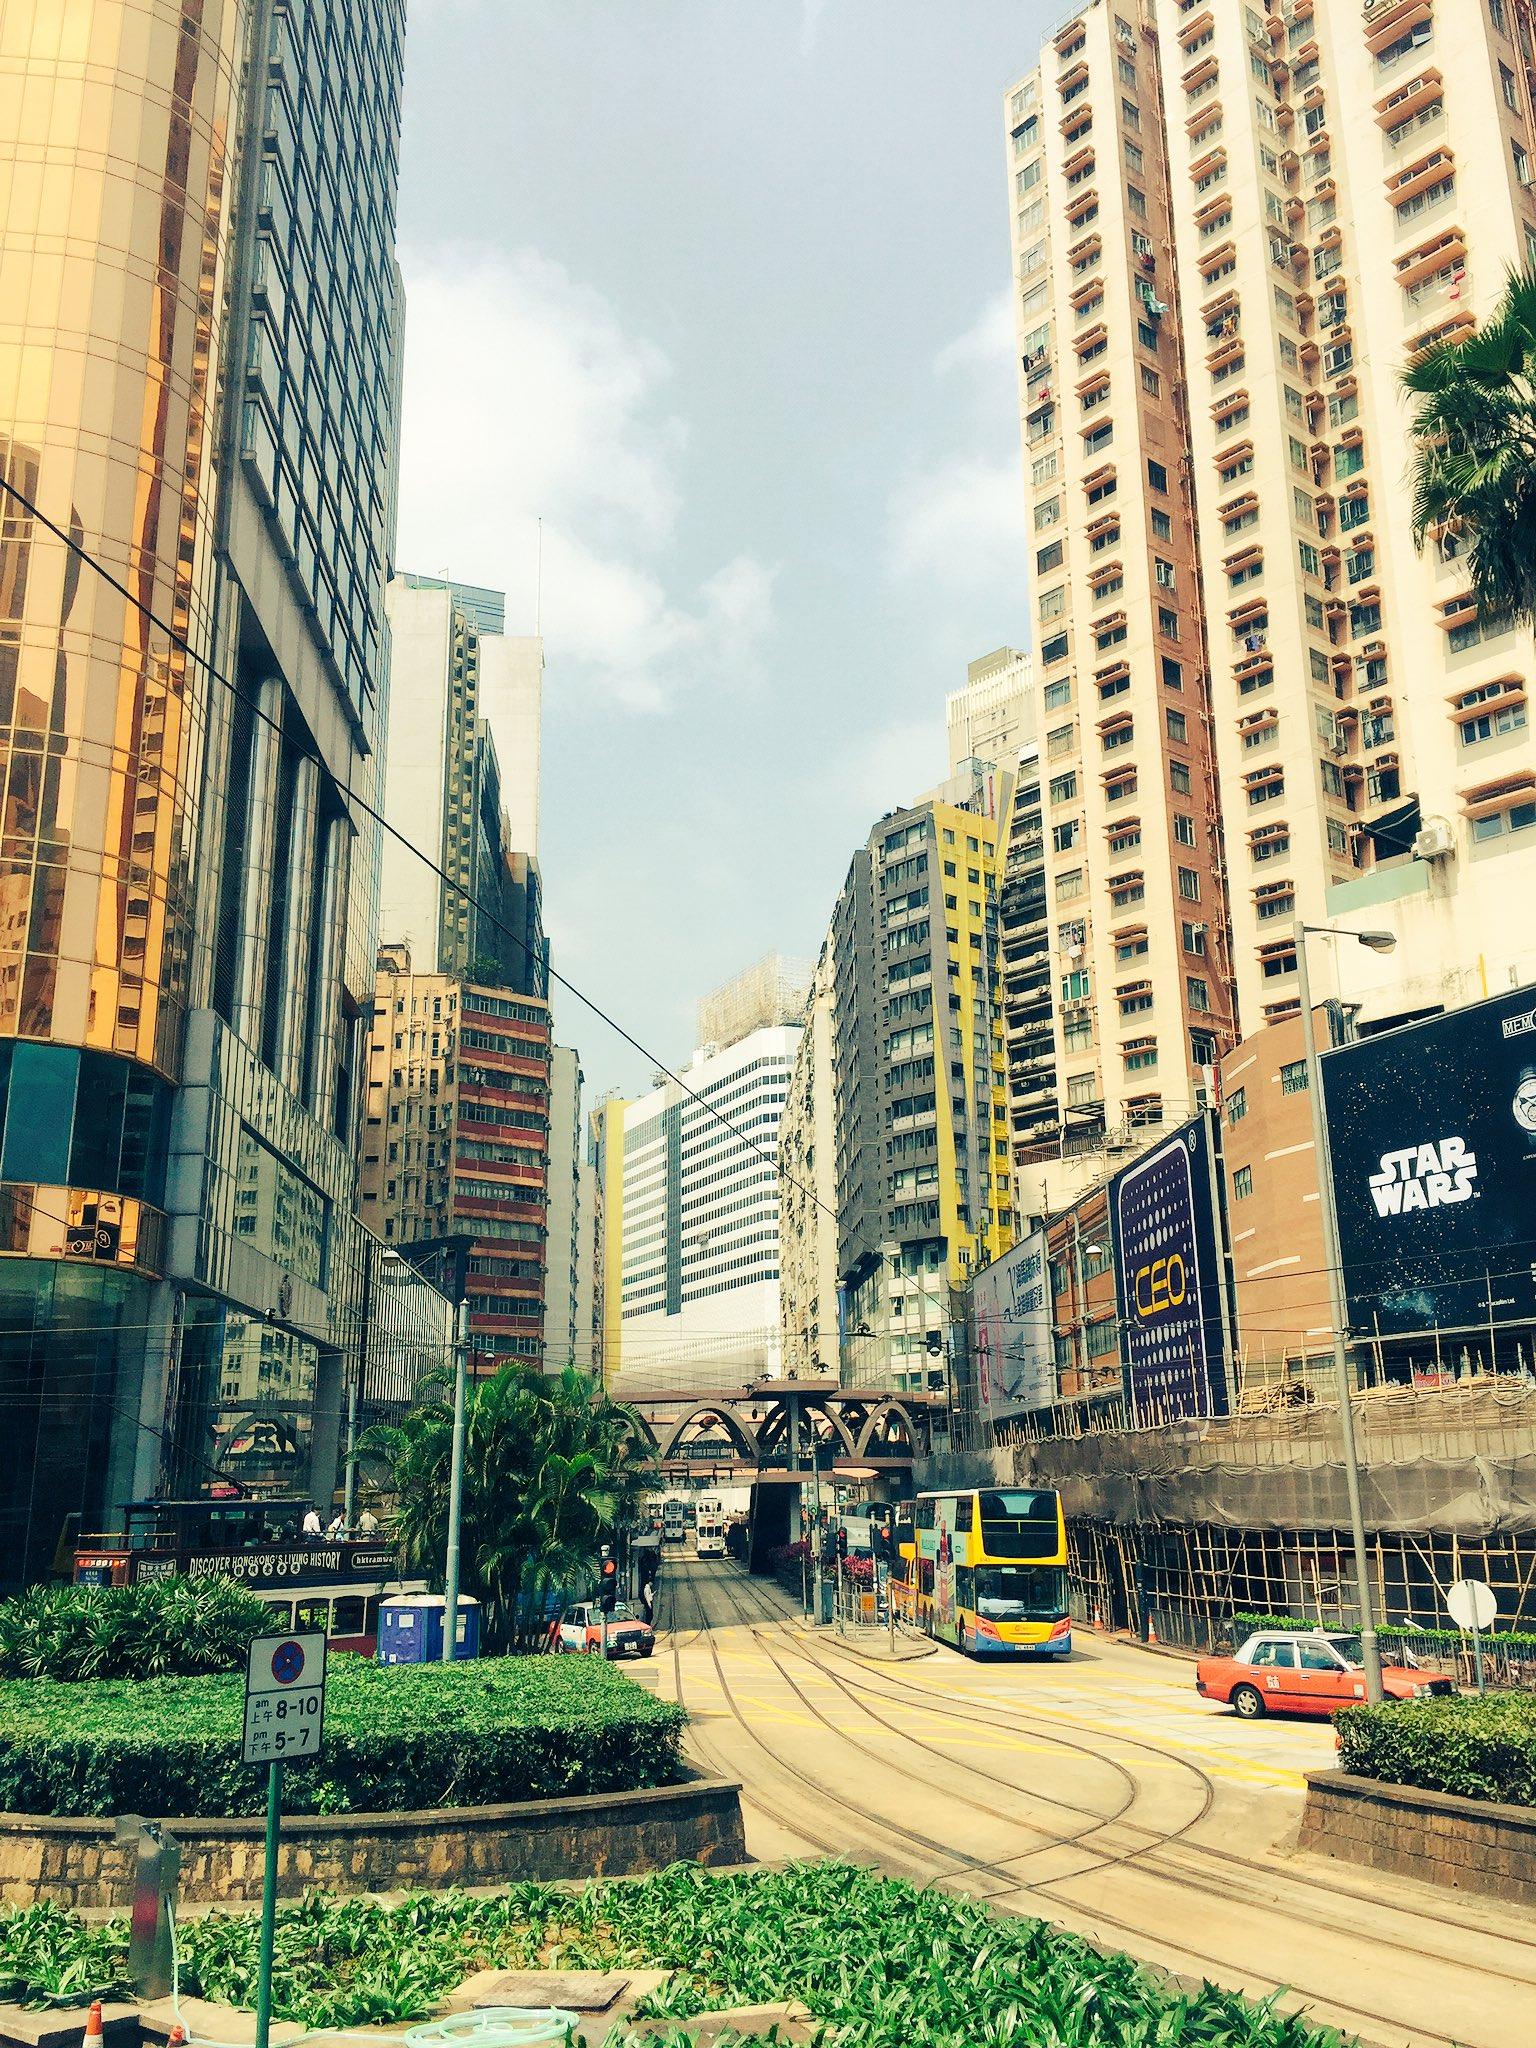 Good morning Hong Kong. https://t.co/LPaYLFuQgN